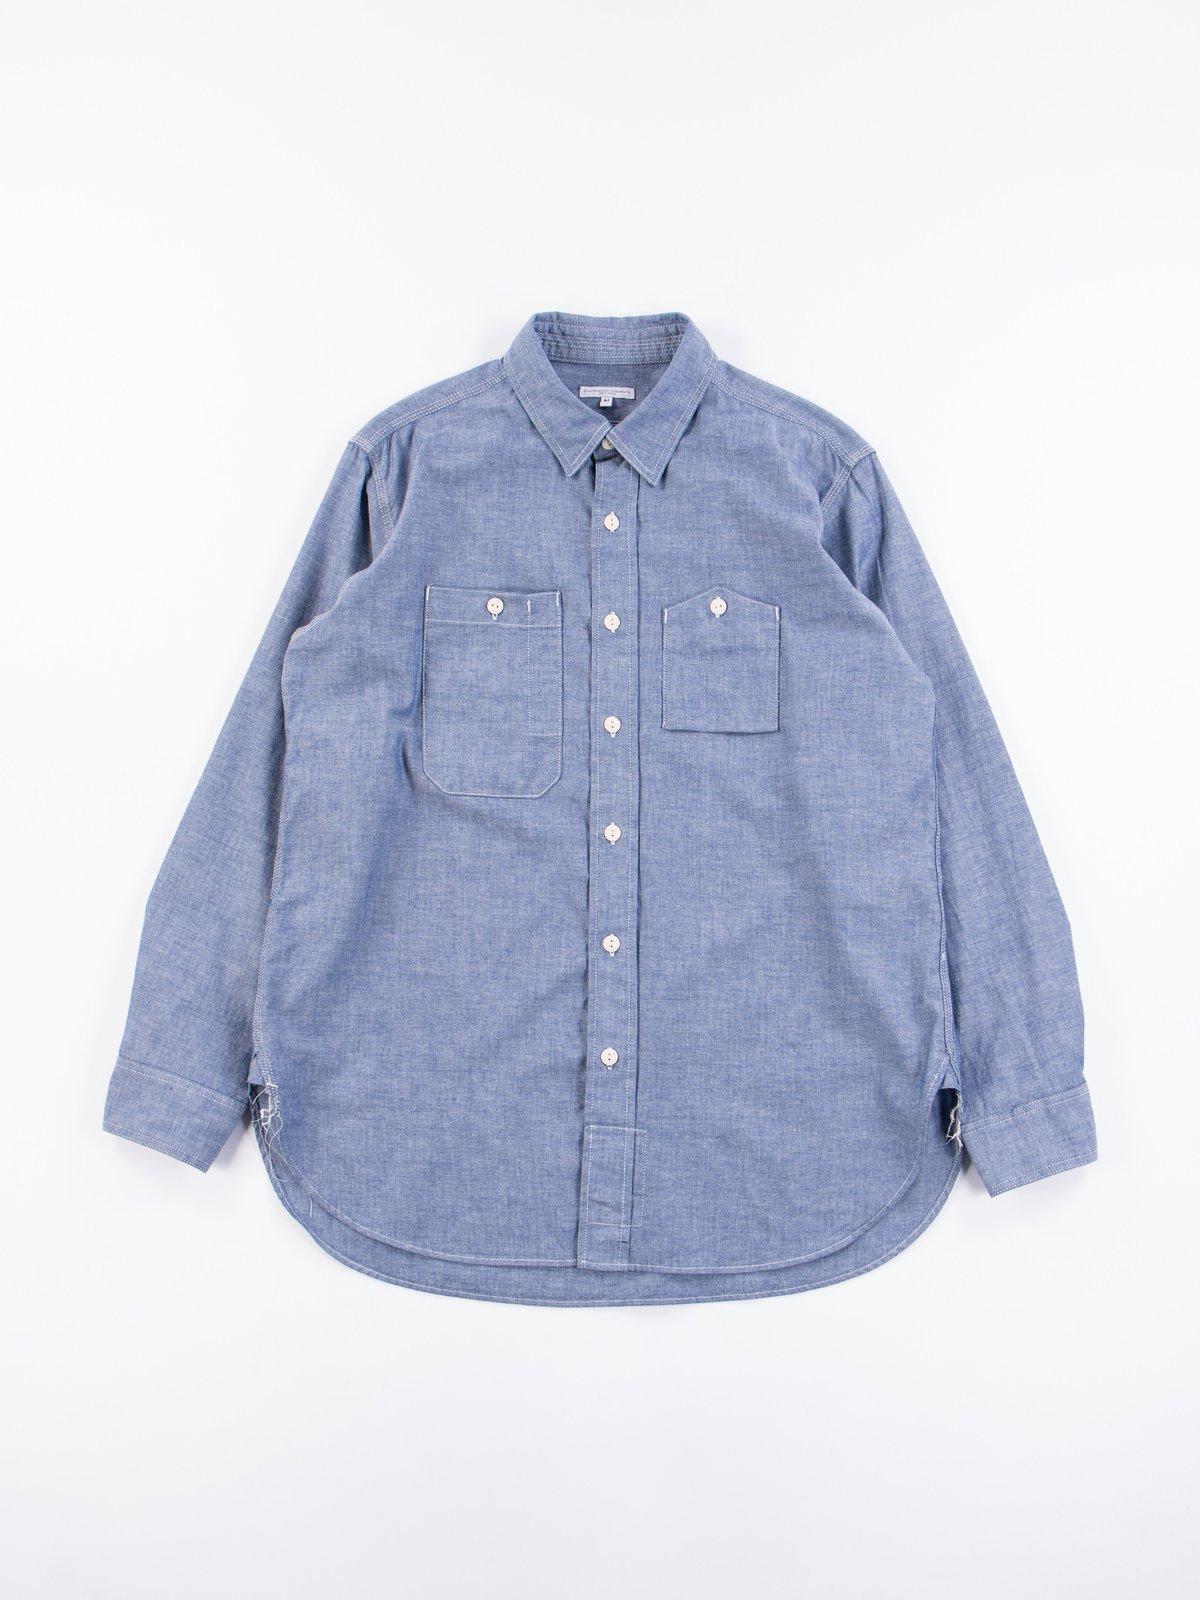 Blue Cotton Chambray Work Shirt - Image 1